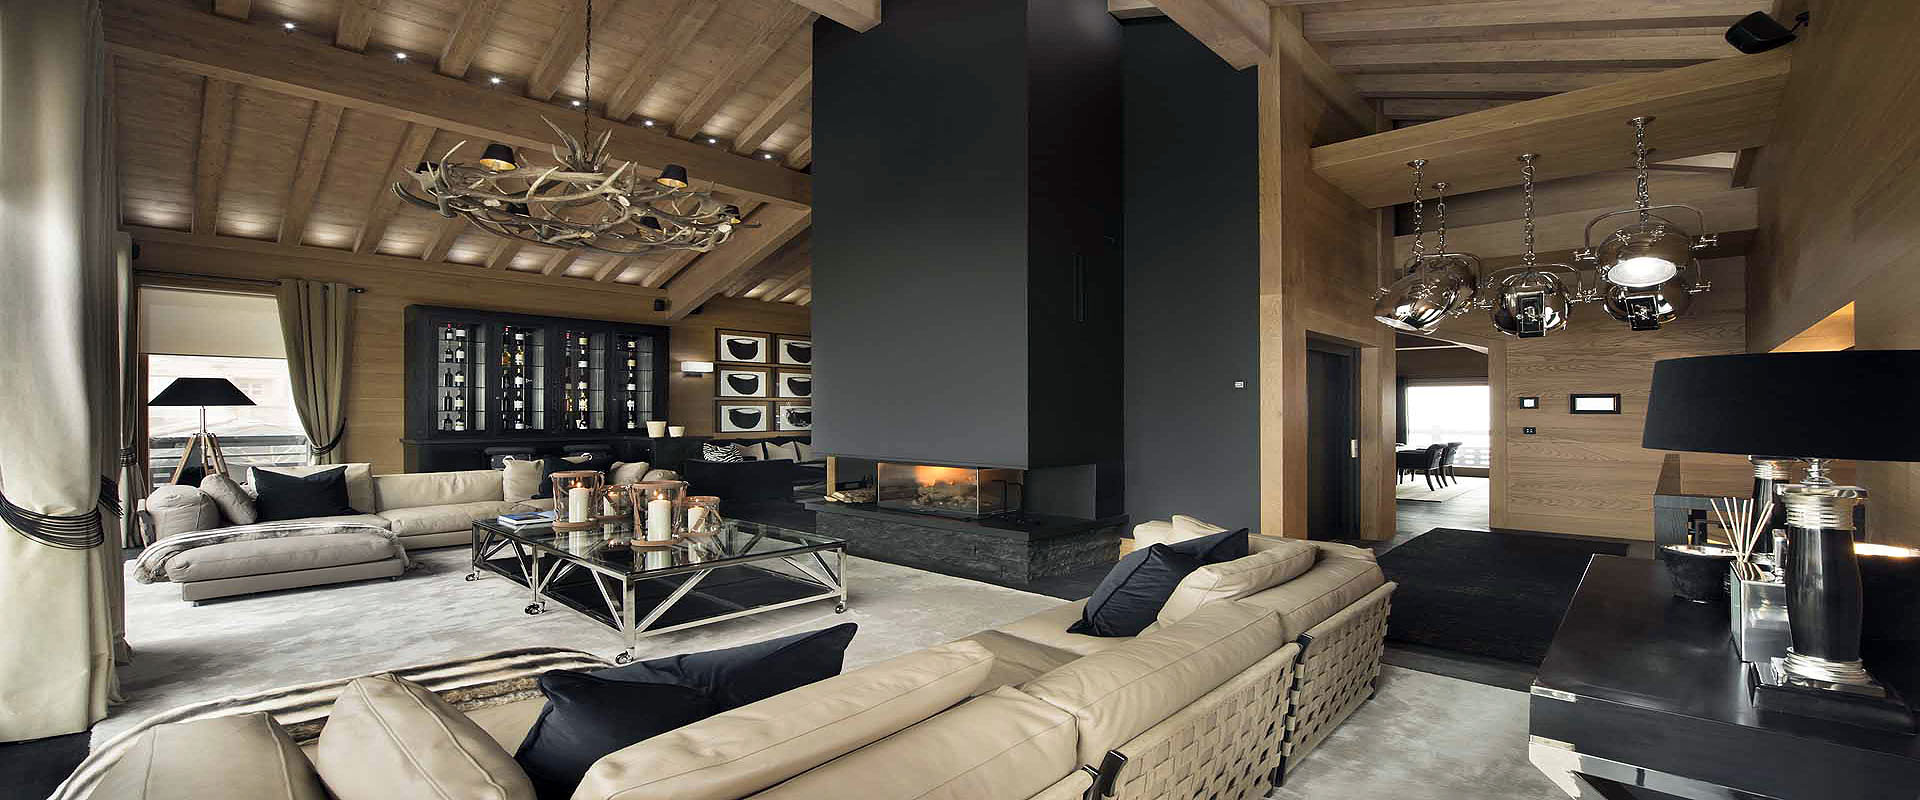 esmeralda-luxury-villas_chalet-snow-palace02